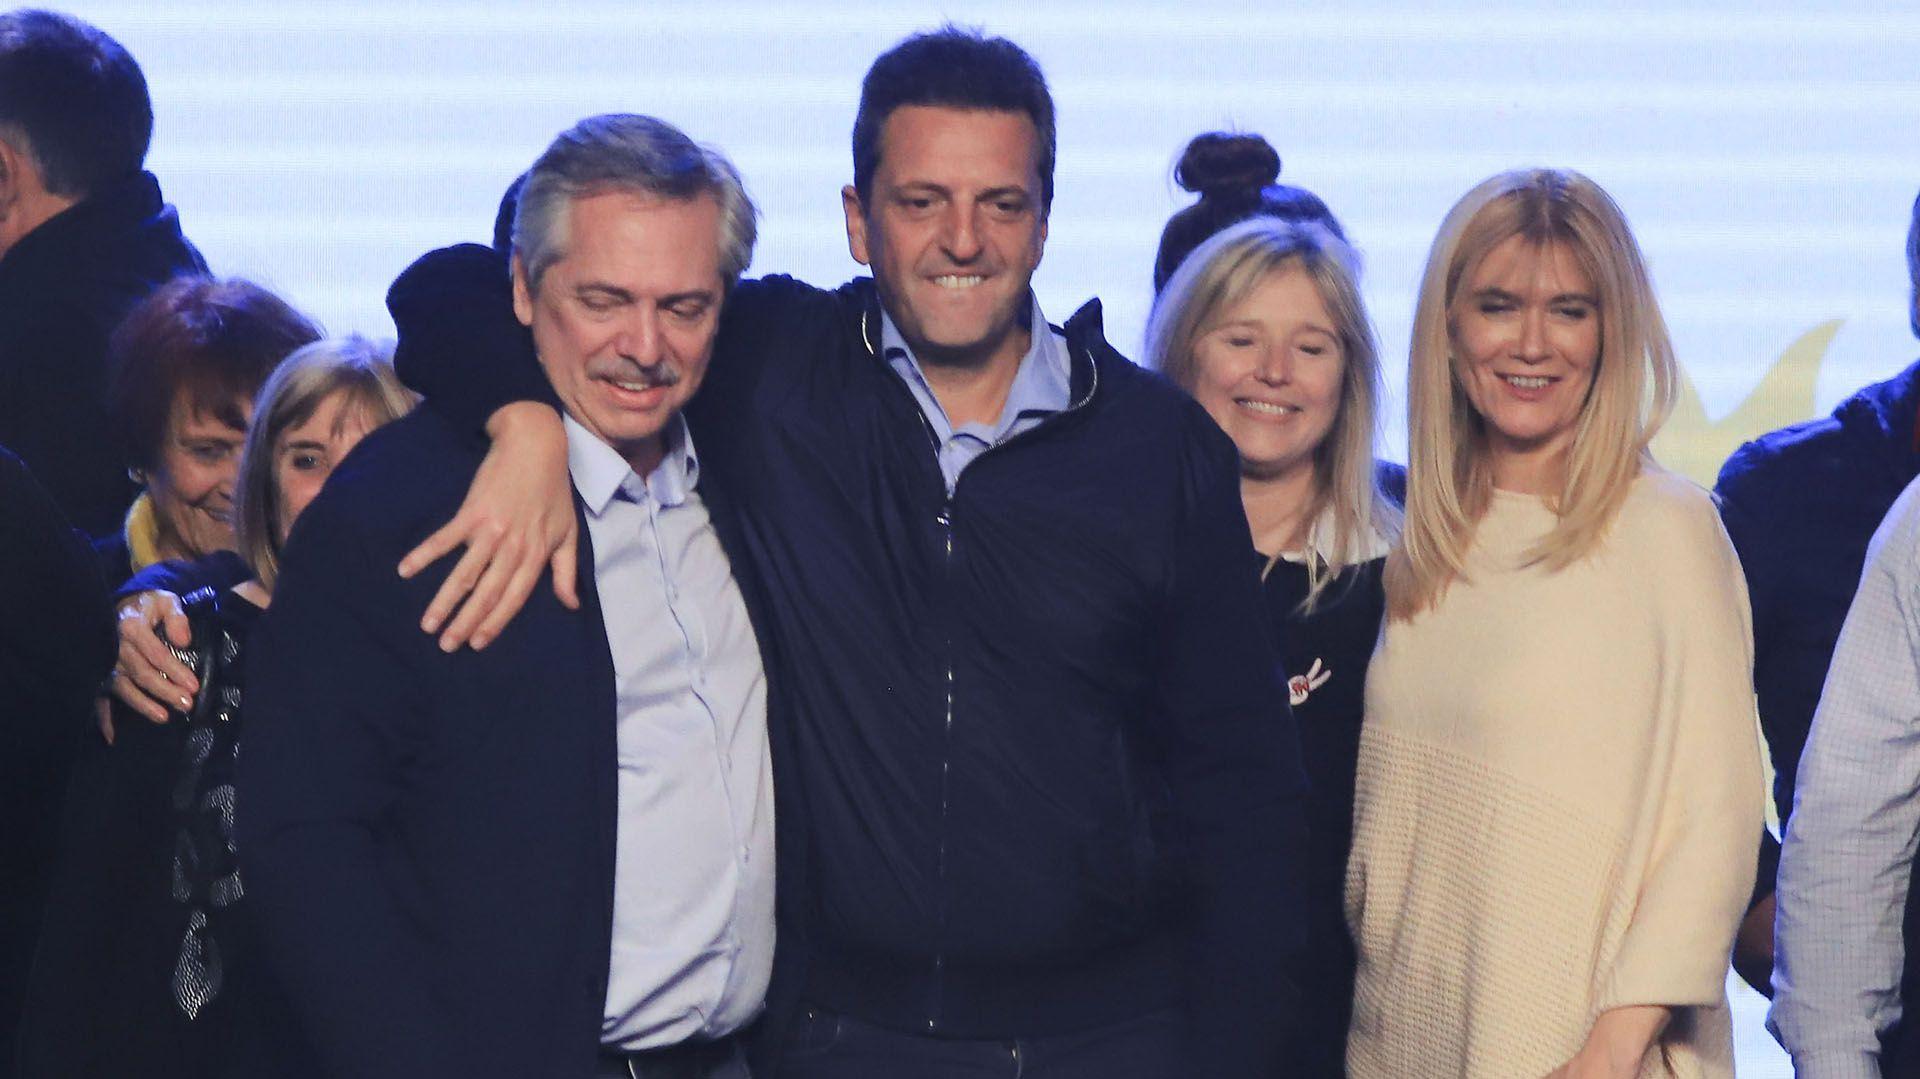 El festejo de Alberto Fernández junto asu novel aliado, Sergio Massa.